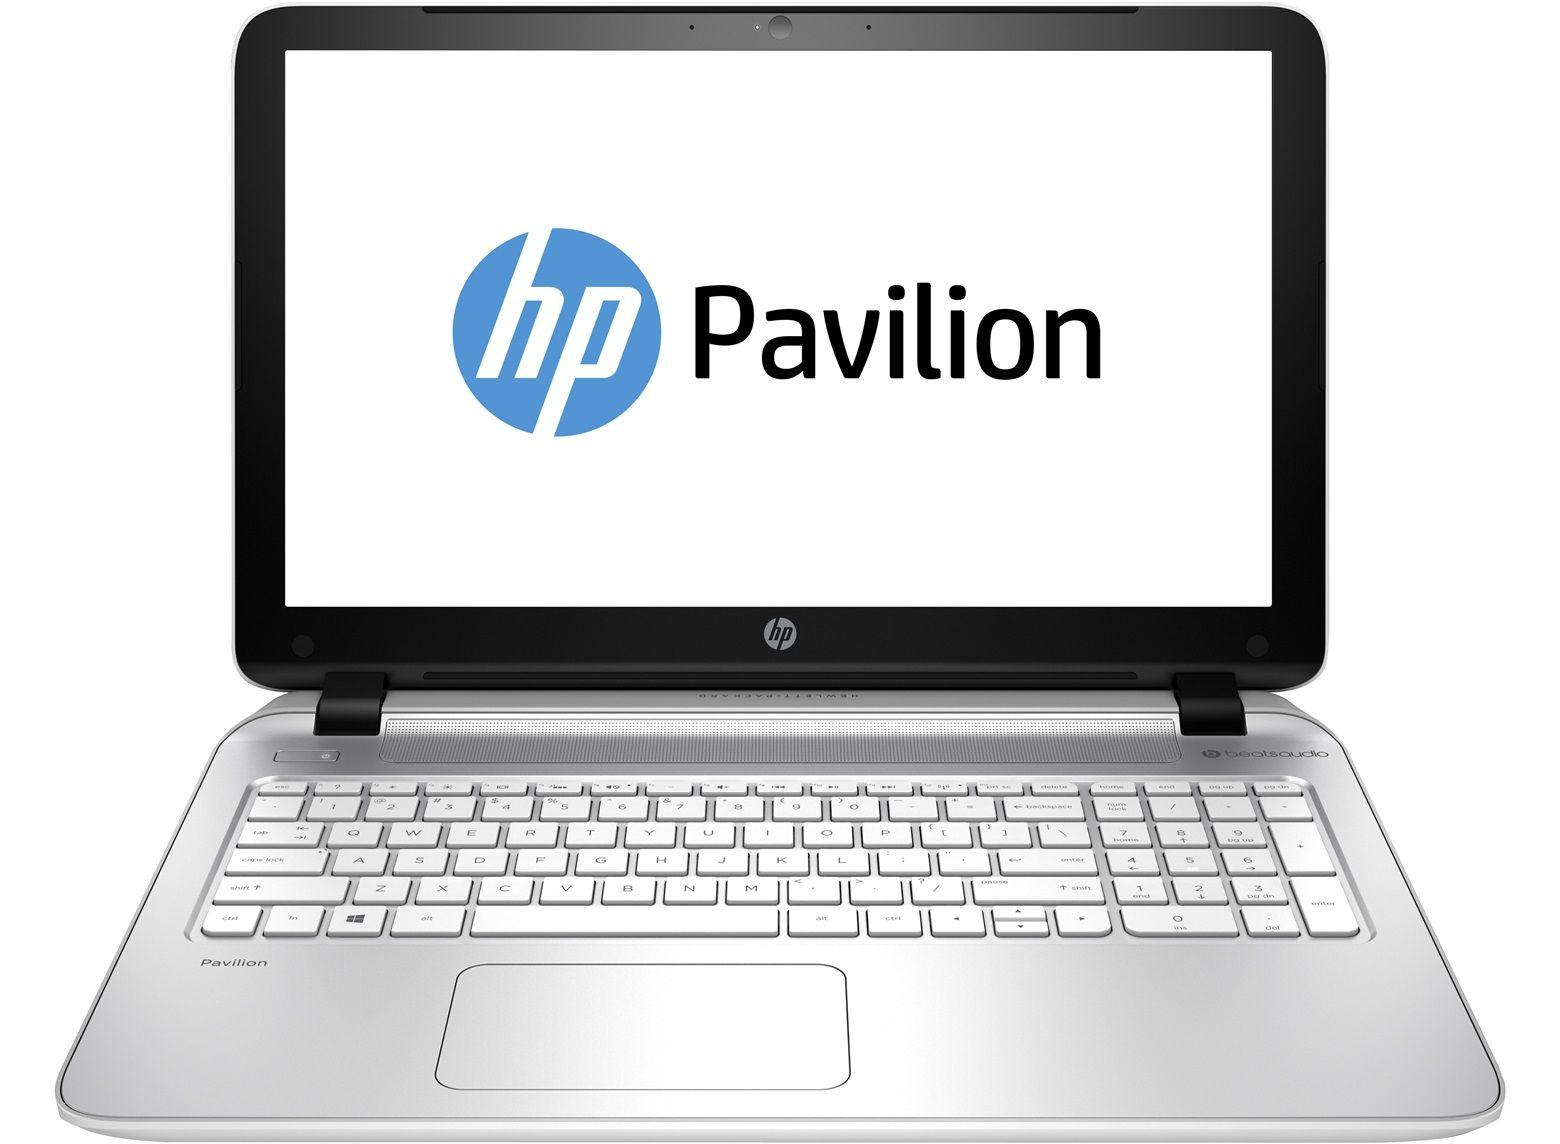 Hp notebook x64-based pc -  999 Hp Pavilion 15 P039ax Notebook Pc Snow White Hp Store Australia